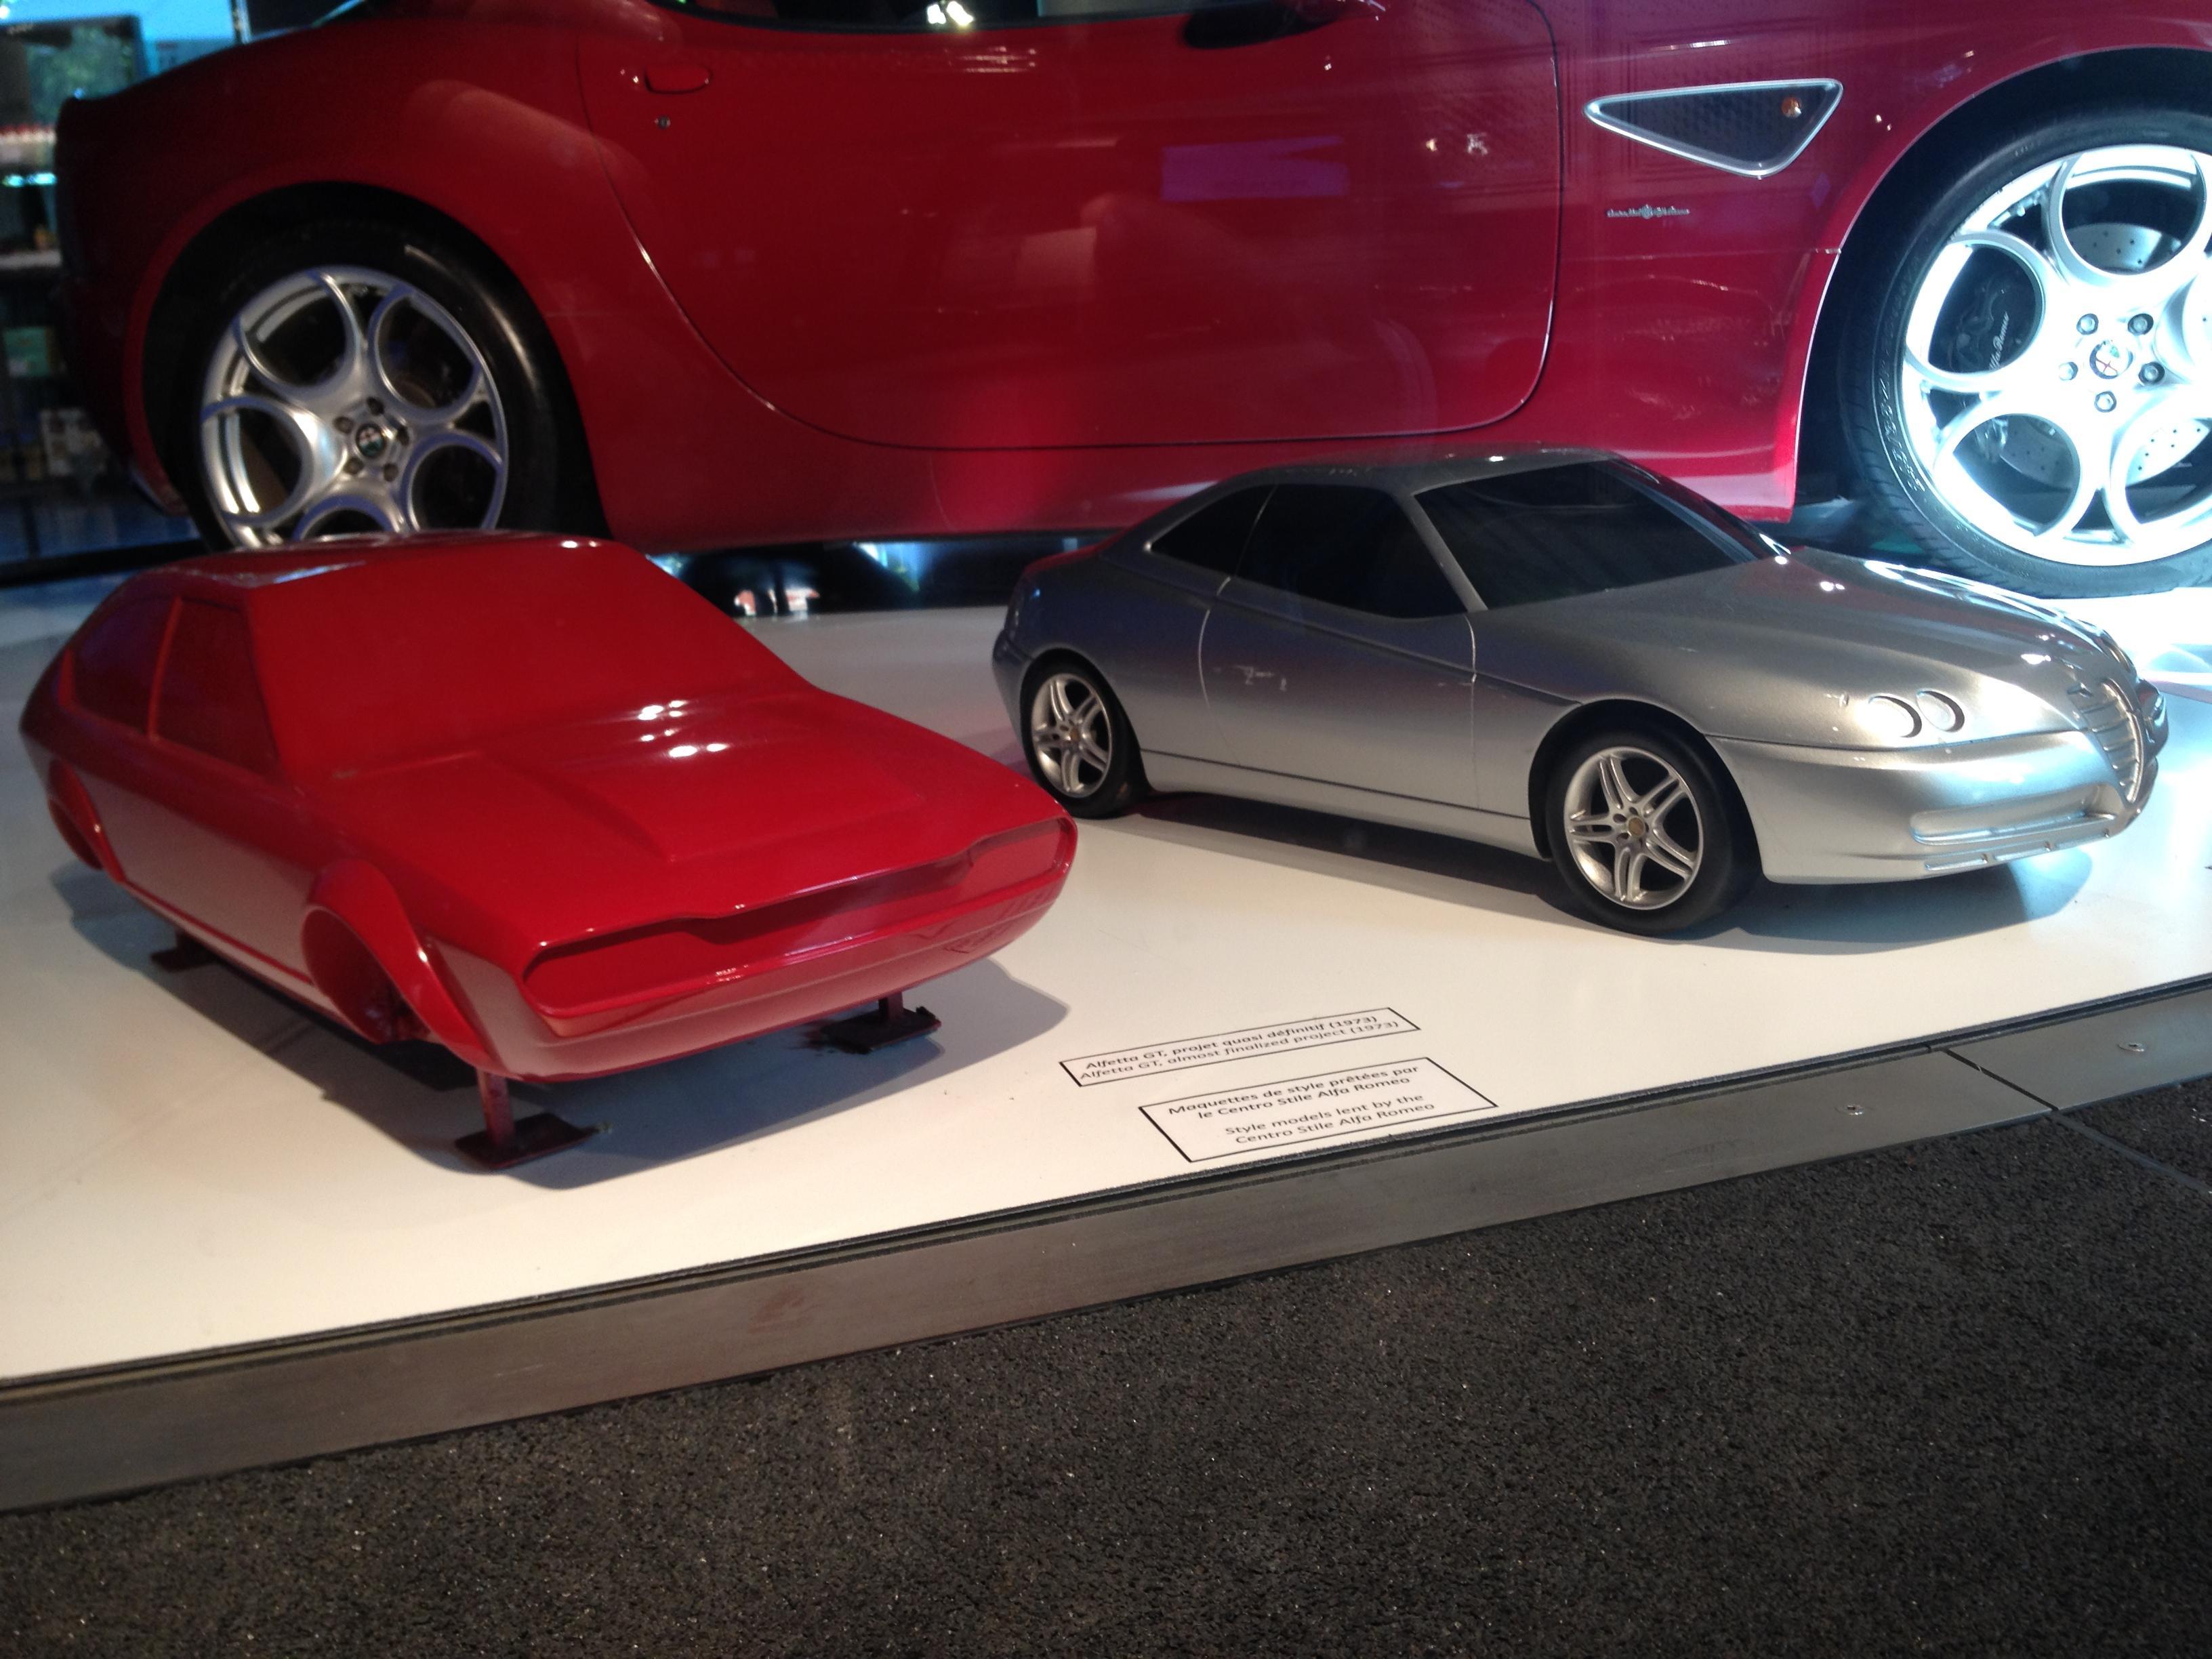 Alfa Romeo - maquettes de style - MotorVillage - 2015 - Photographie Laurent H